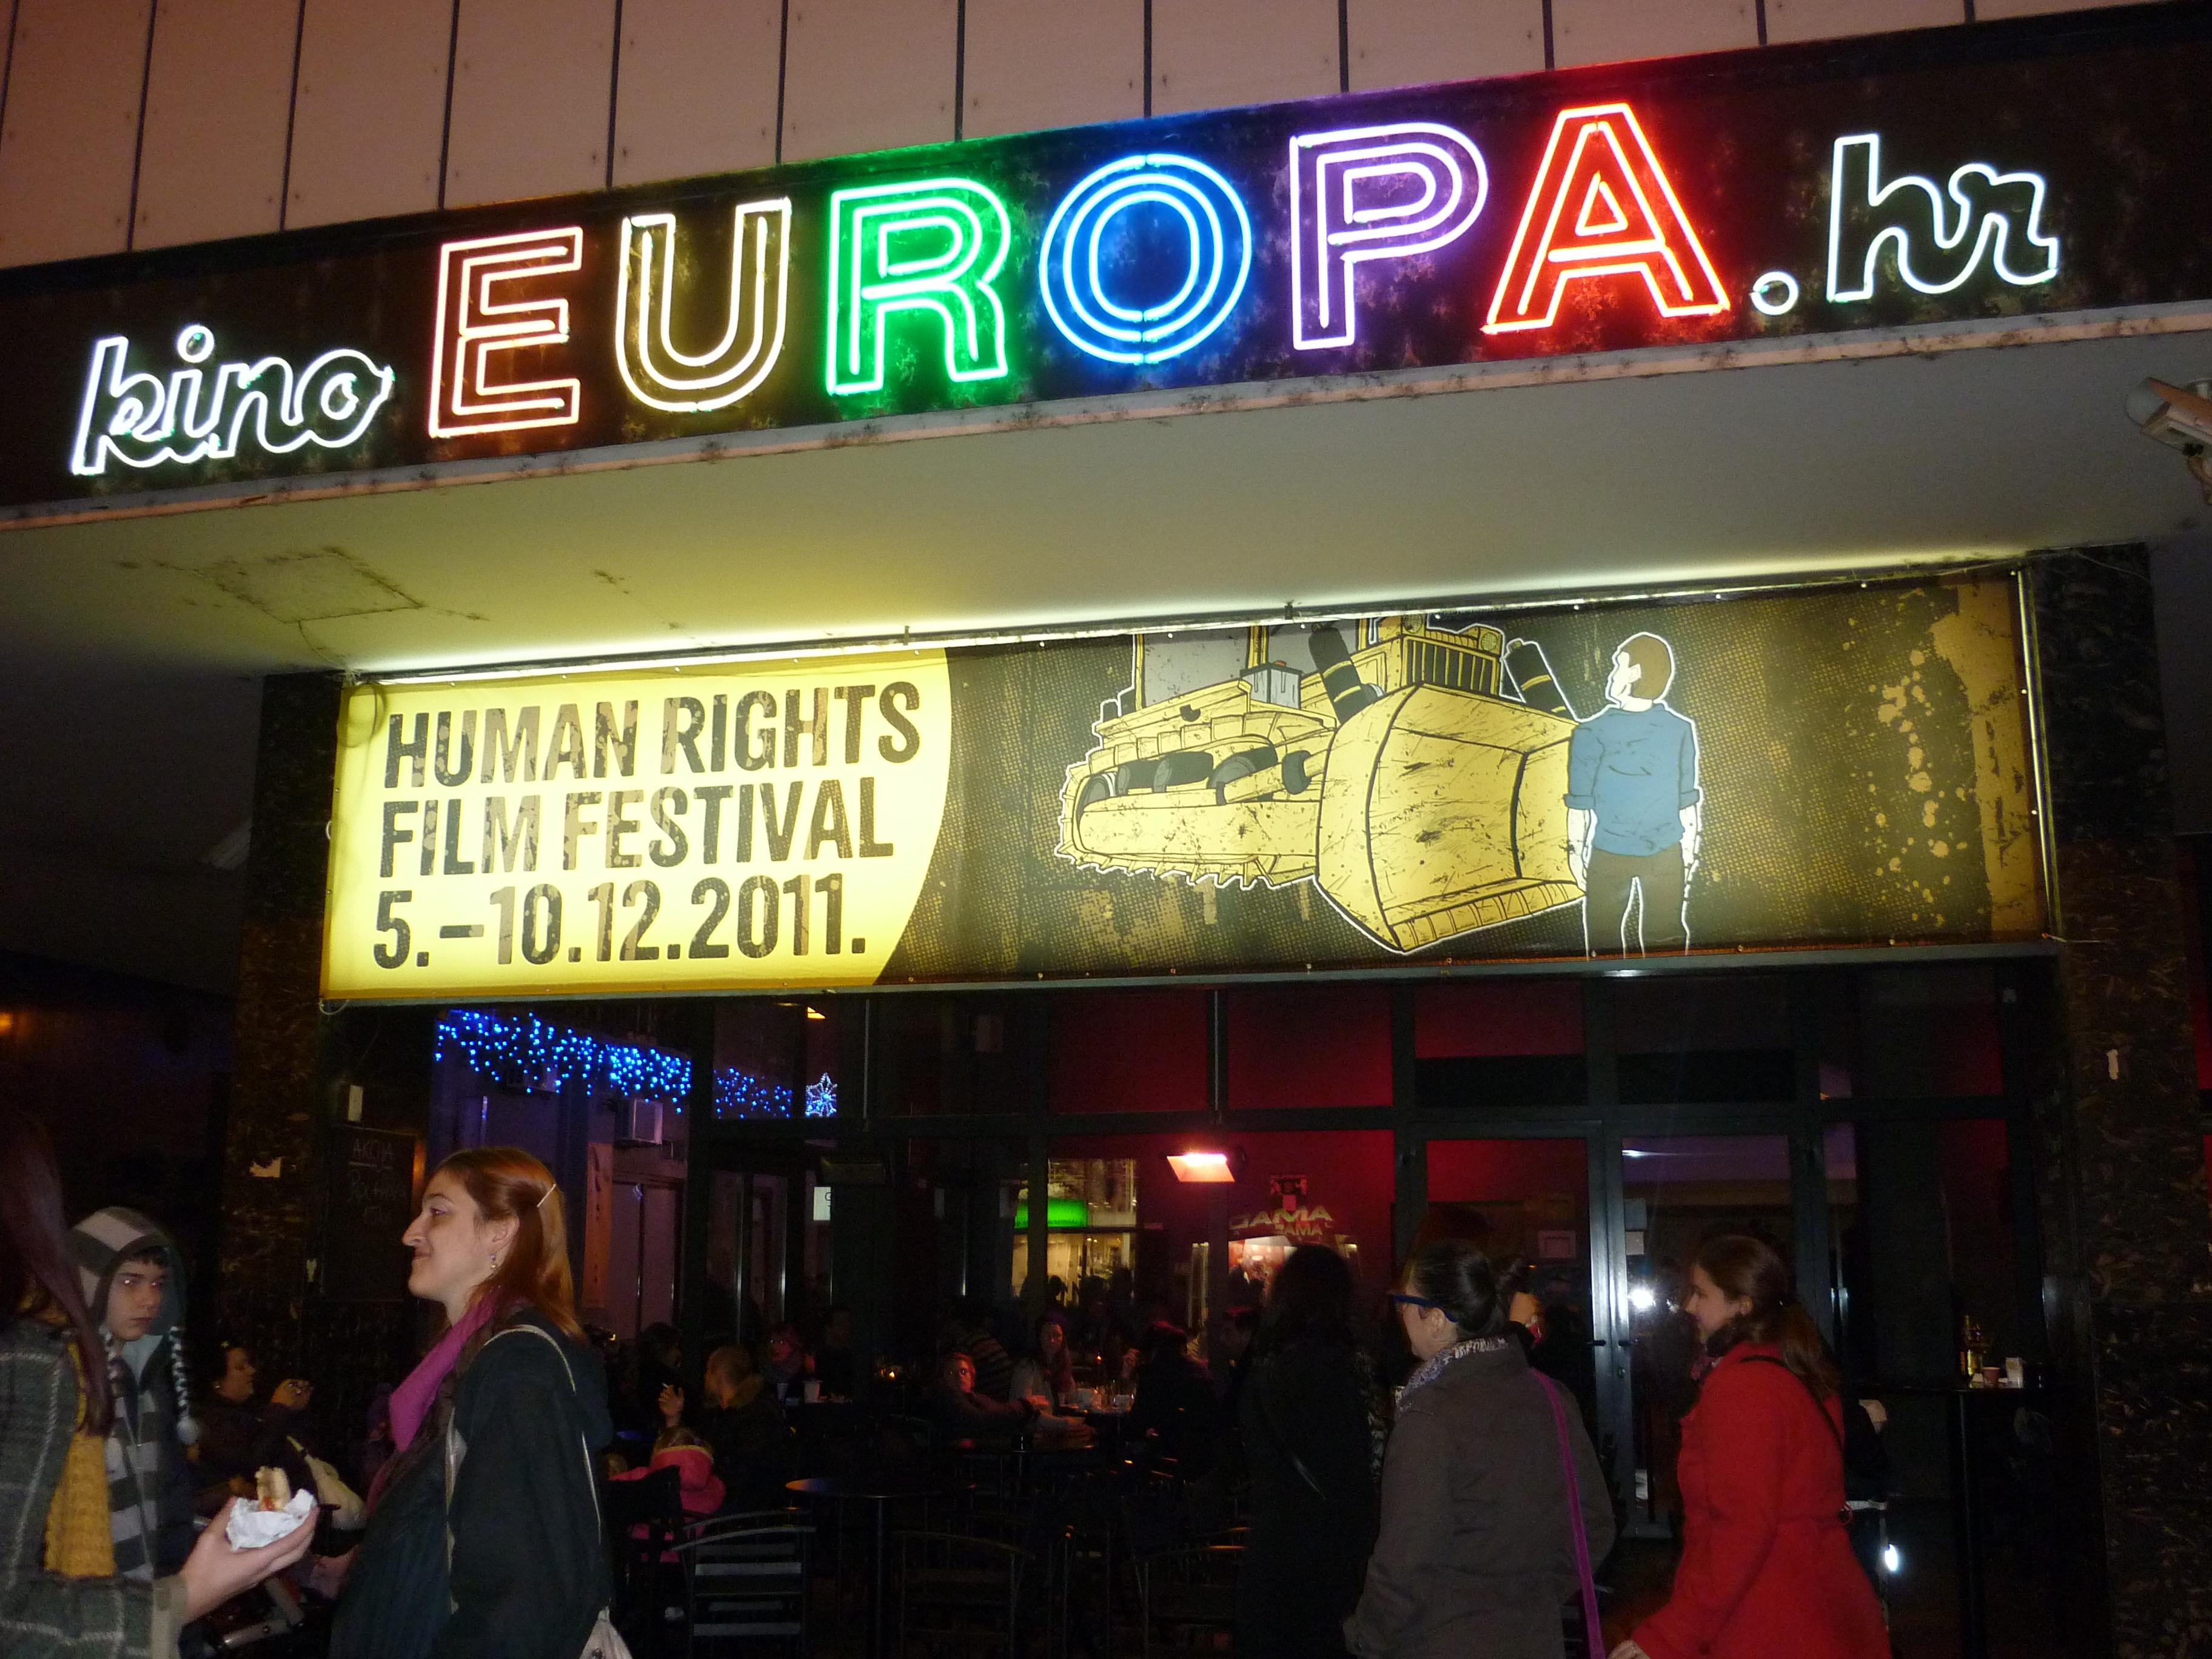 Europa Kino Grünstadt